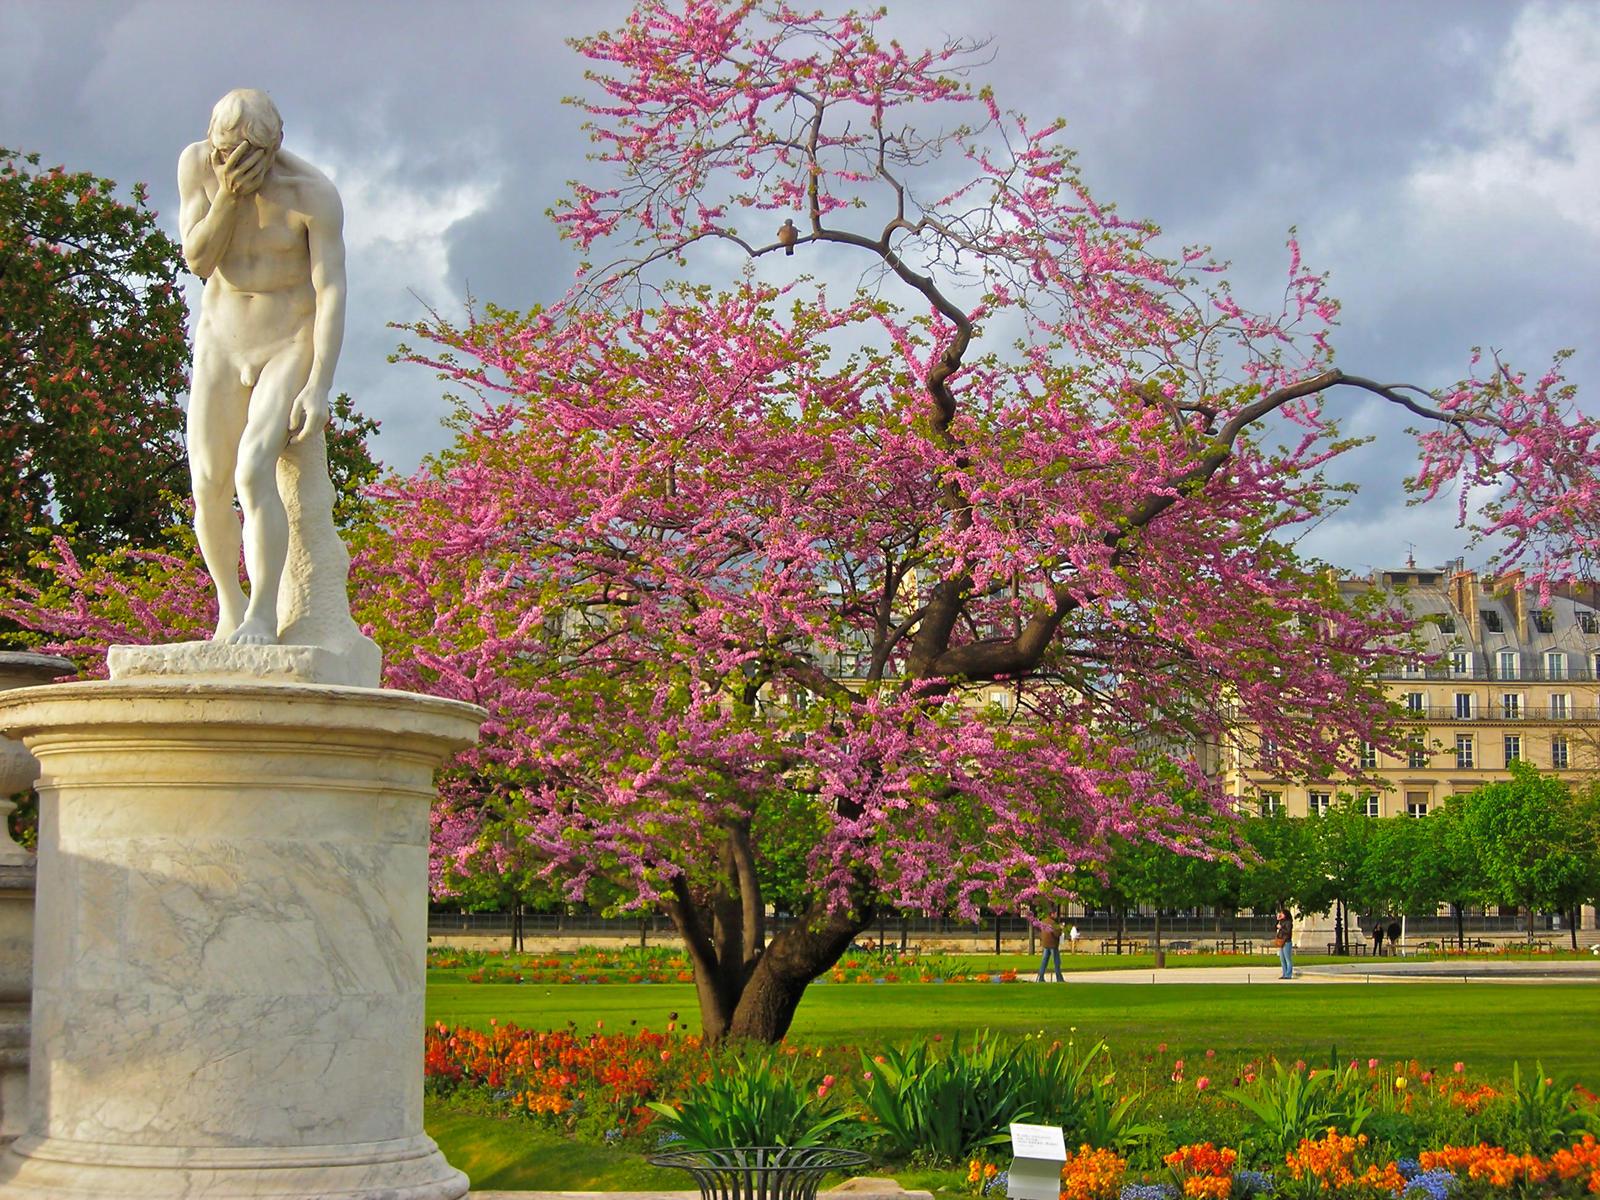 Paris jardin des tuileries by casiisla on deviantart for Jardin des tuilerie